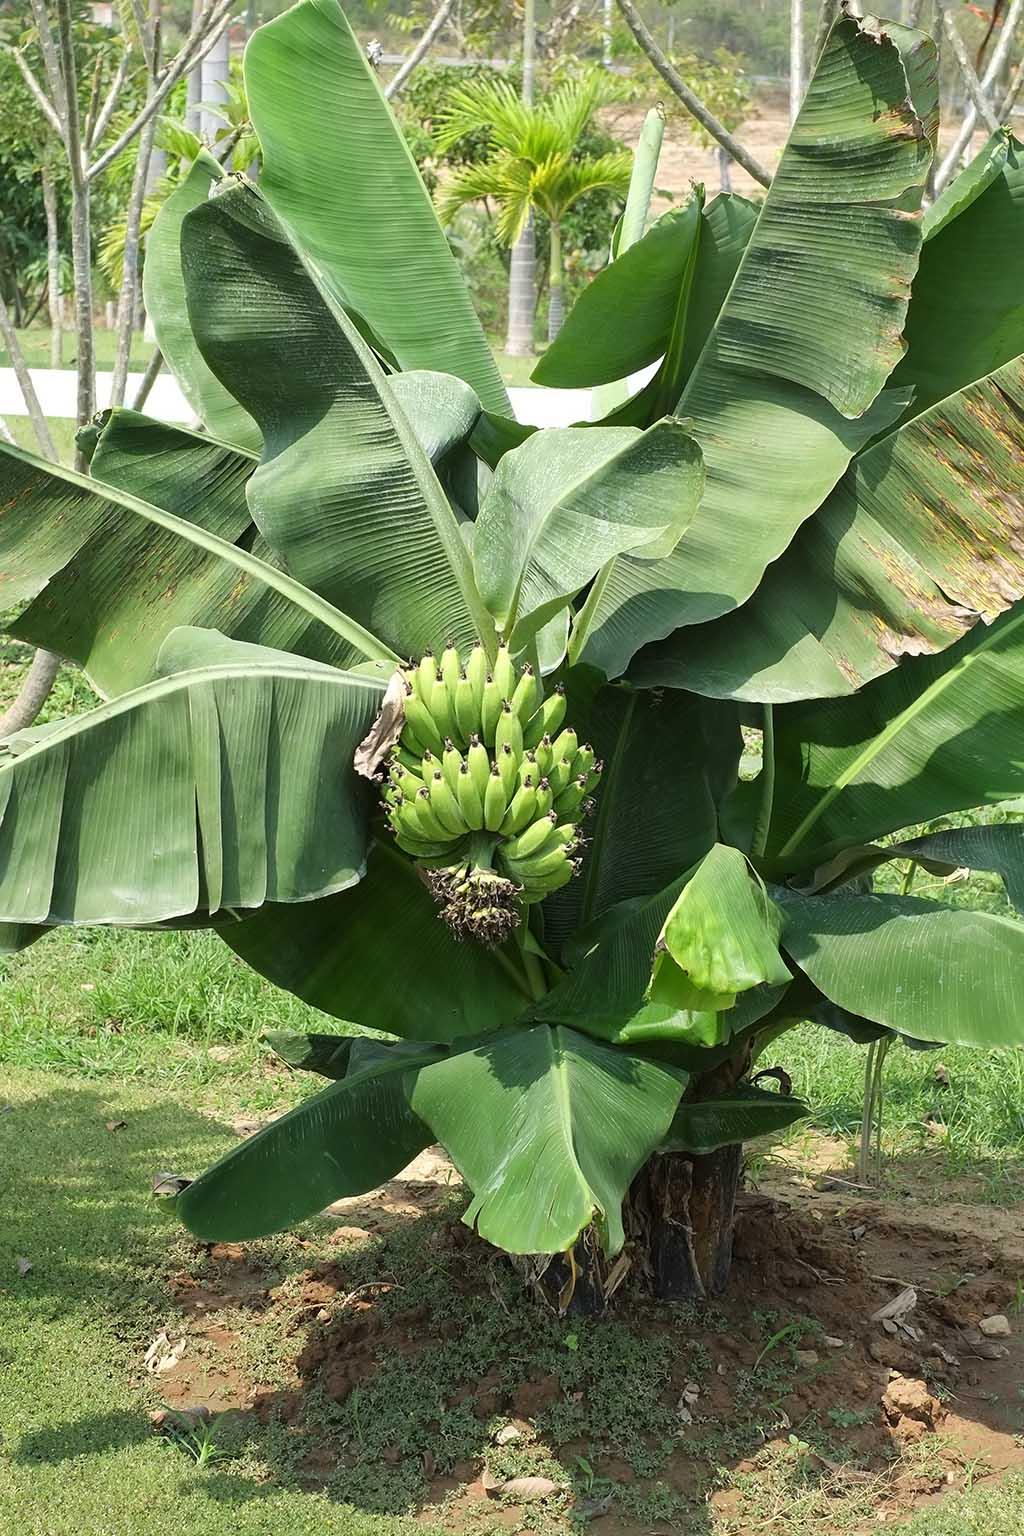 A banana plant